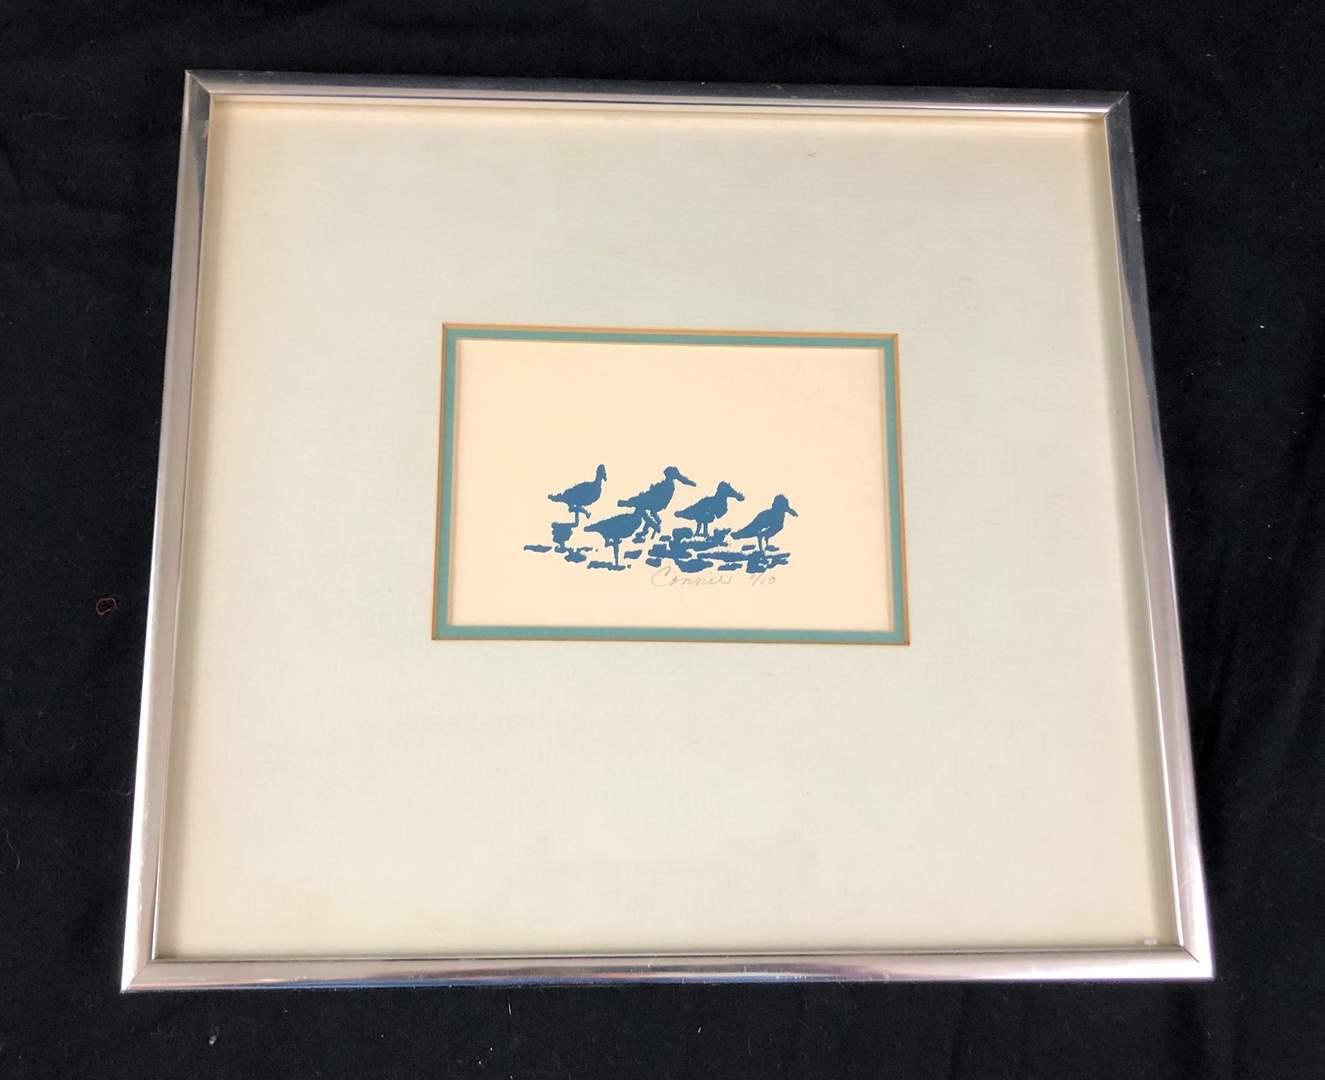 Lot # 234 Framed signed Art (main image)